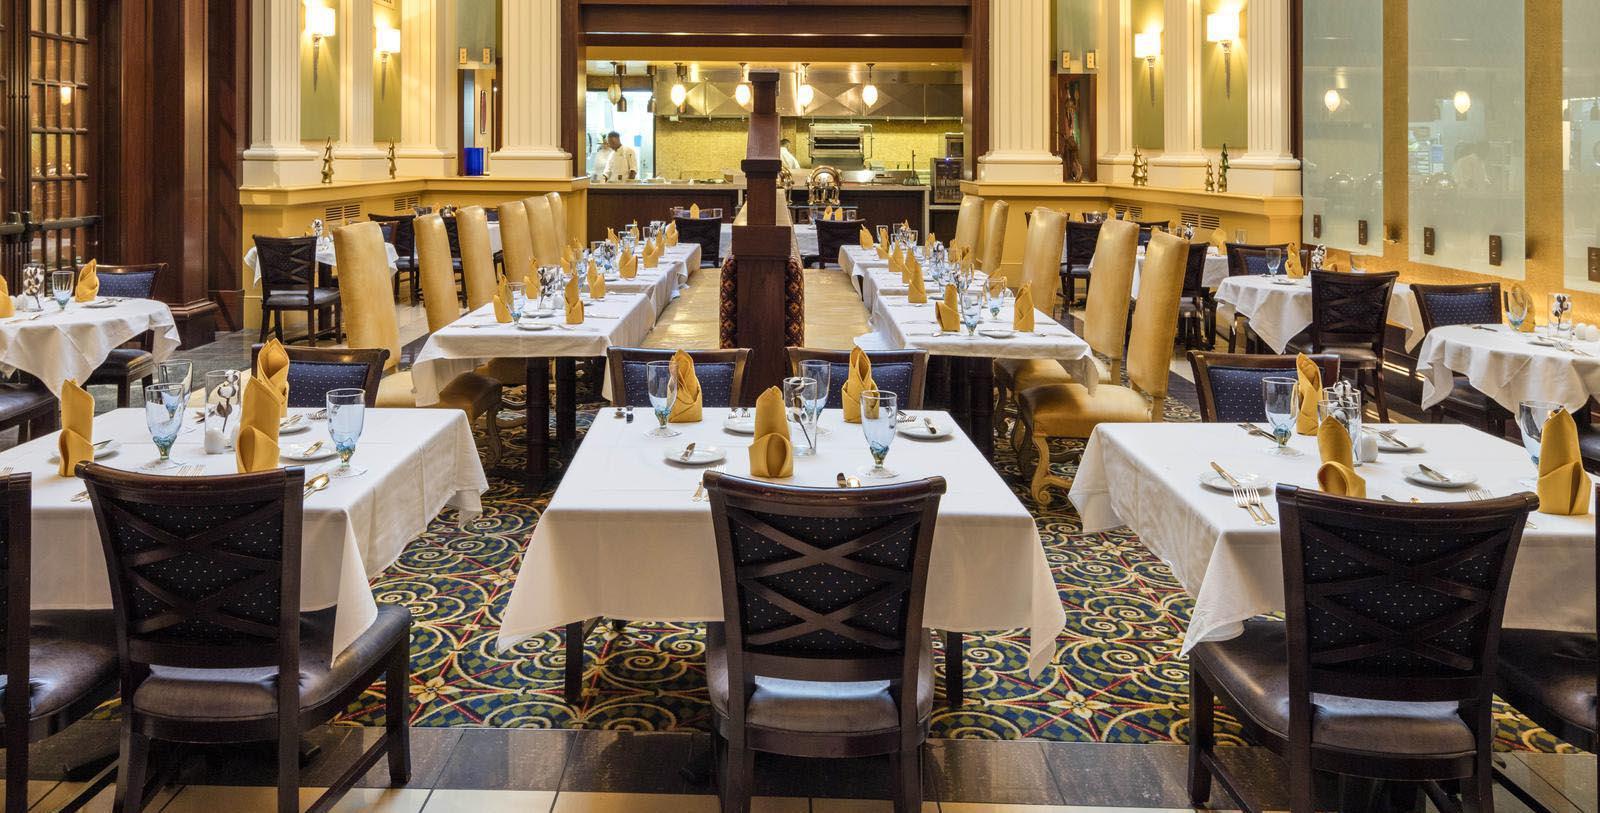 Image of Trellis Room Restaurant Dining Room at Battle House Renaissance Mobile Hotel & Spa, 1852, Member of Historic Hotels of America, in Mobile, Alabama, Taste